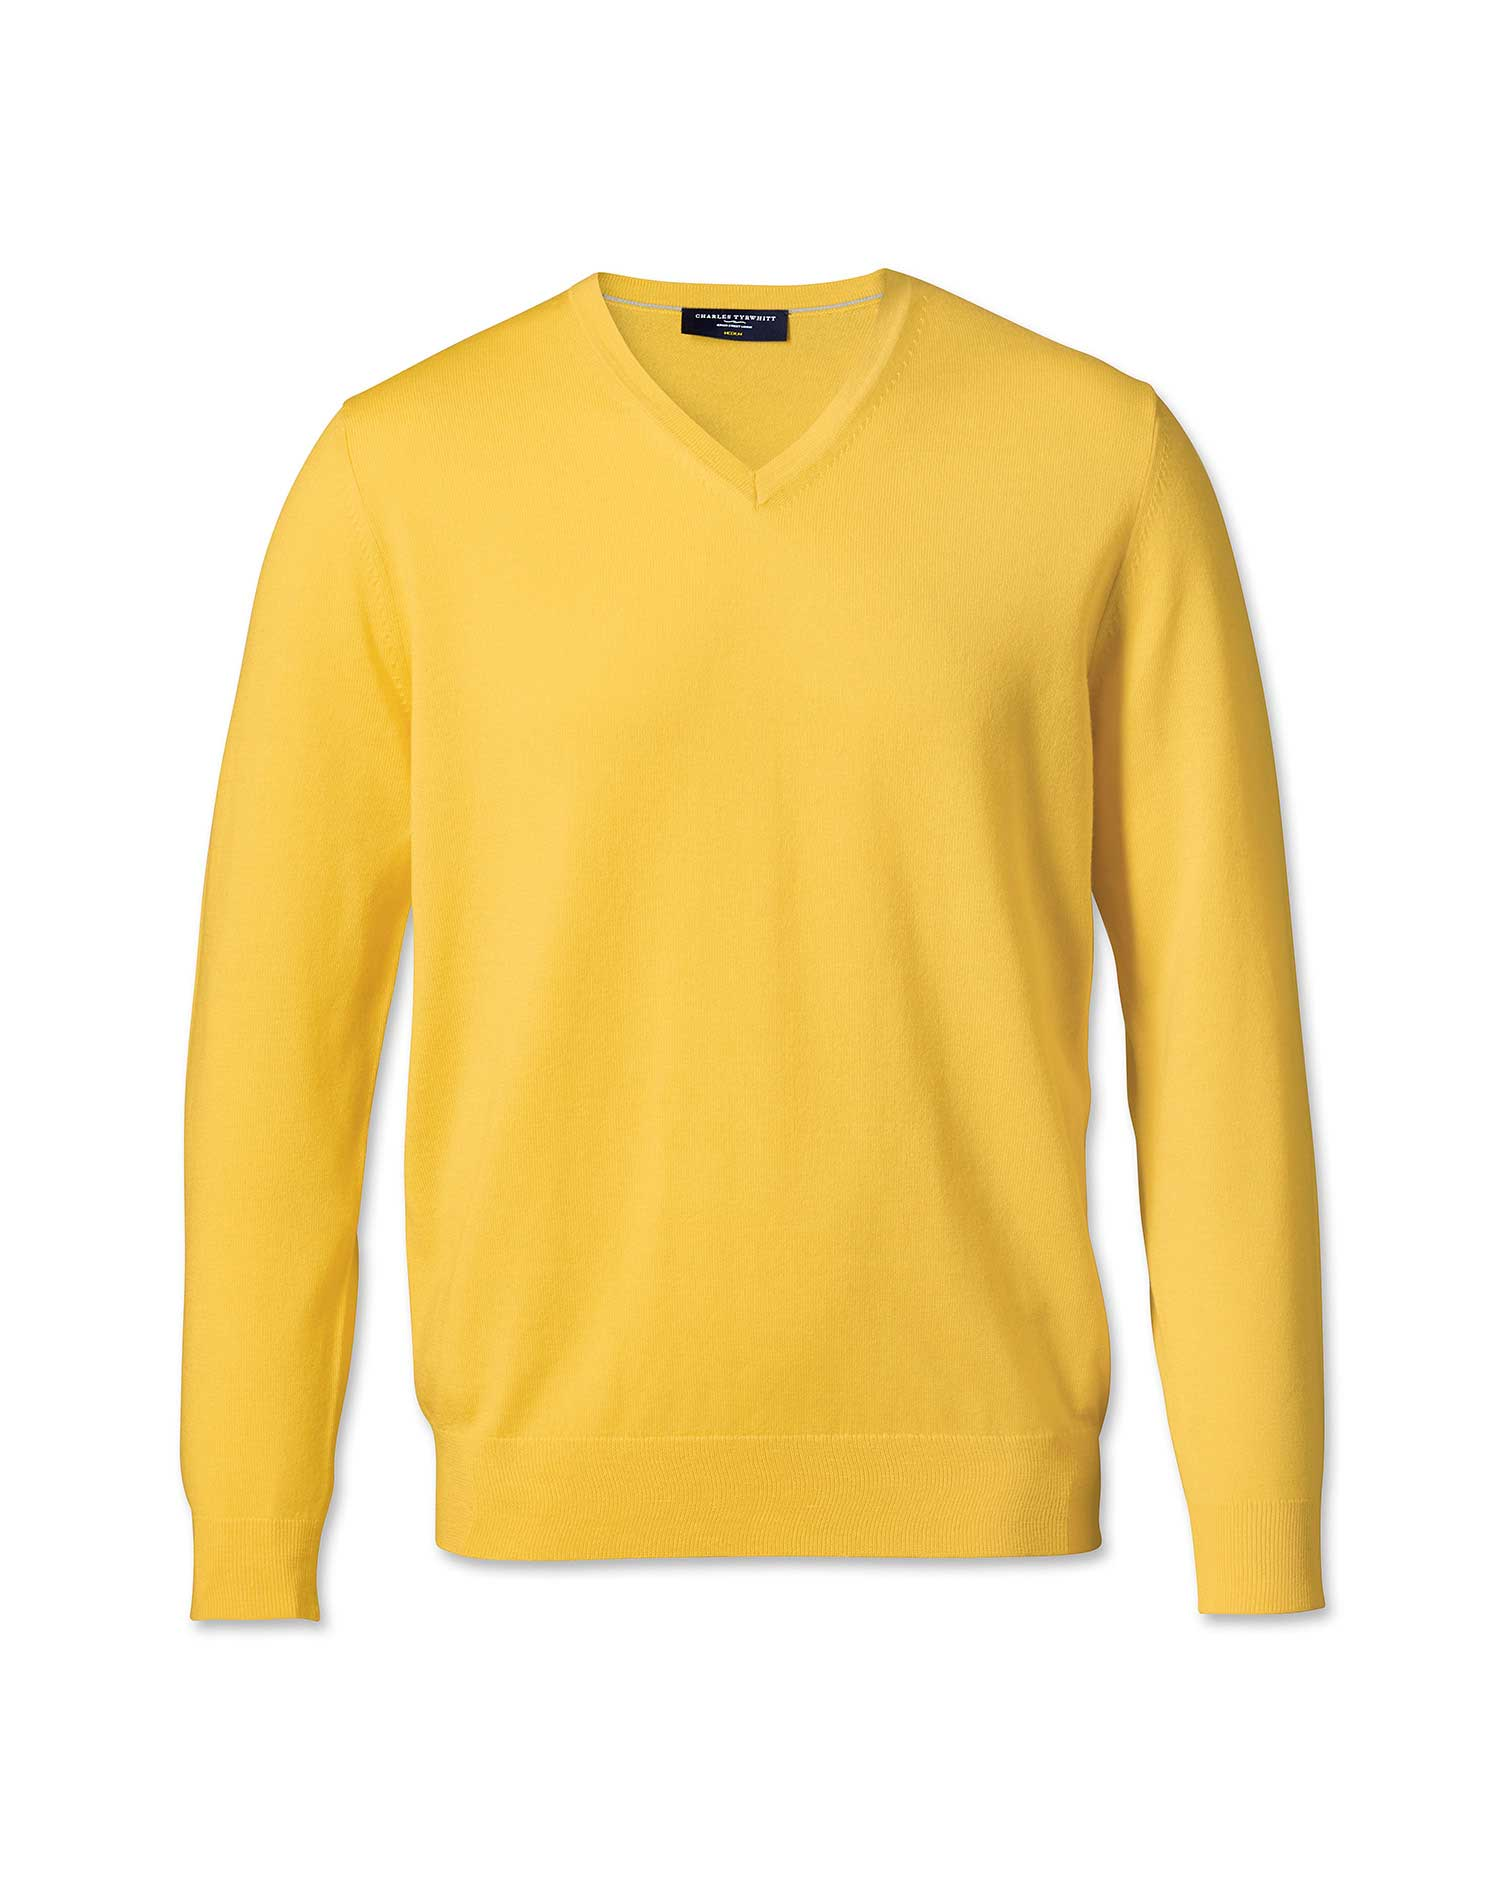 Yellow Merino Wool V-Neck Jumper Size Small by Charles Tyrwhitt